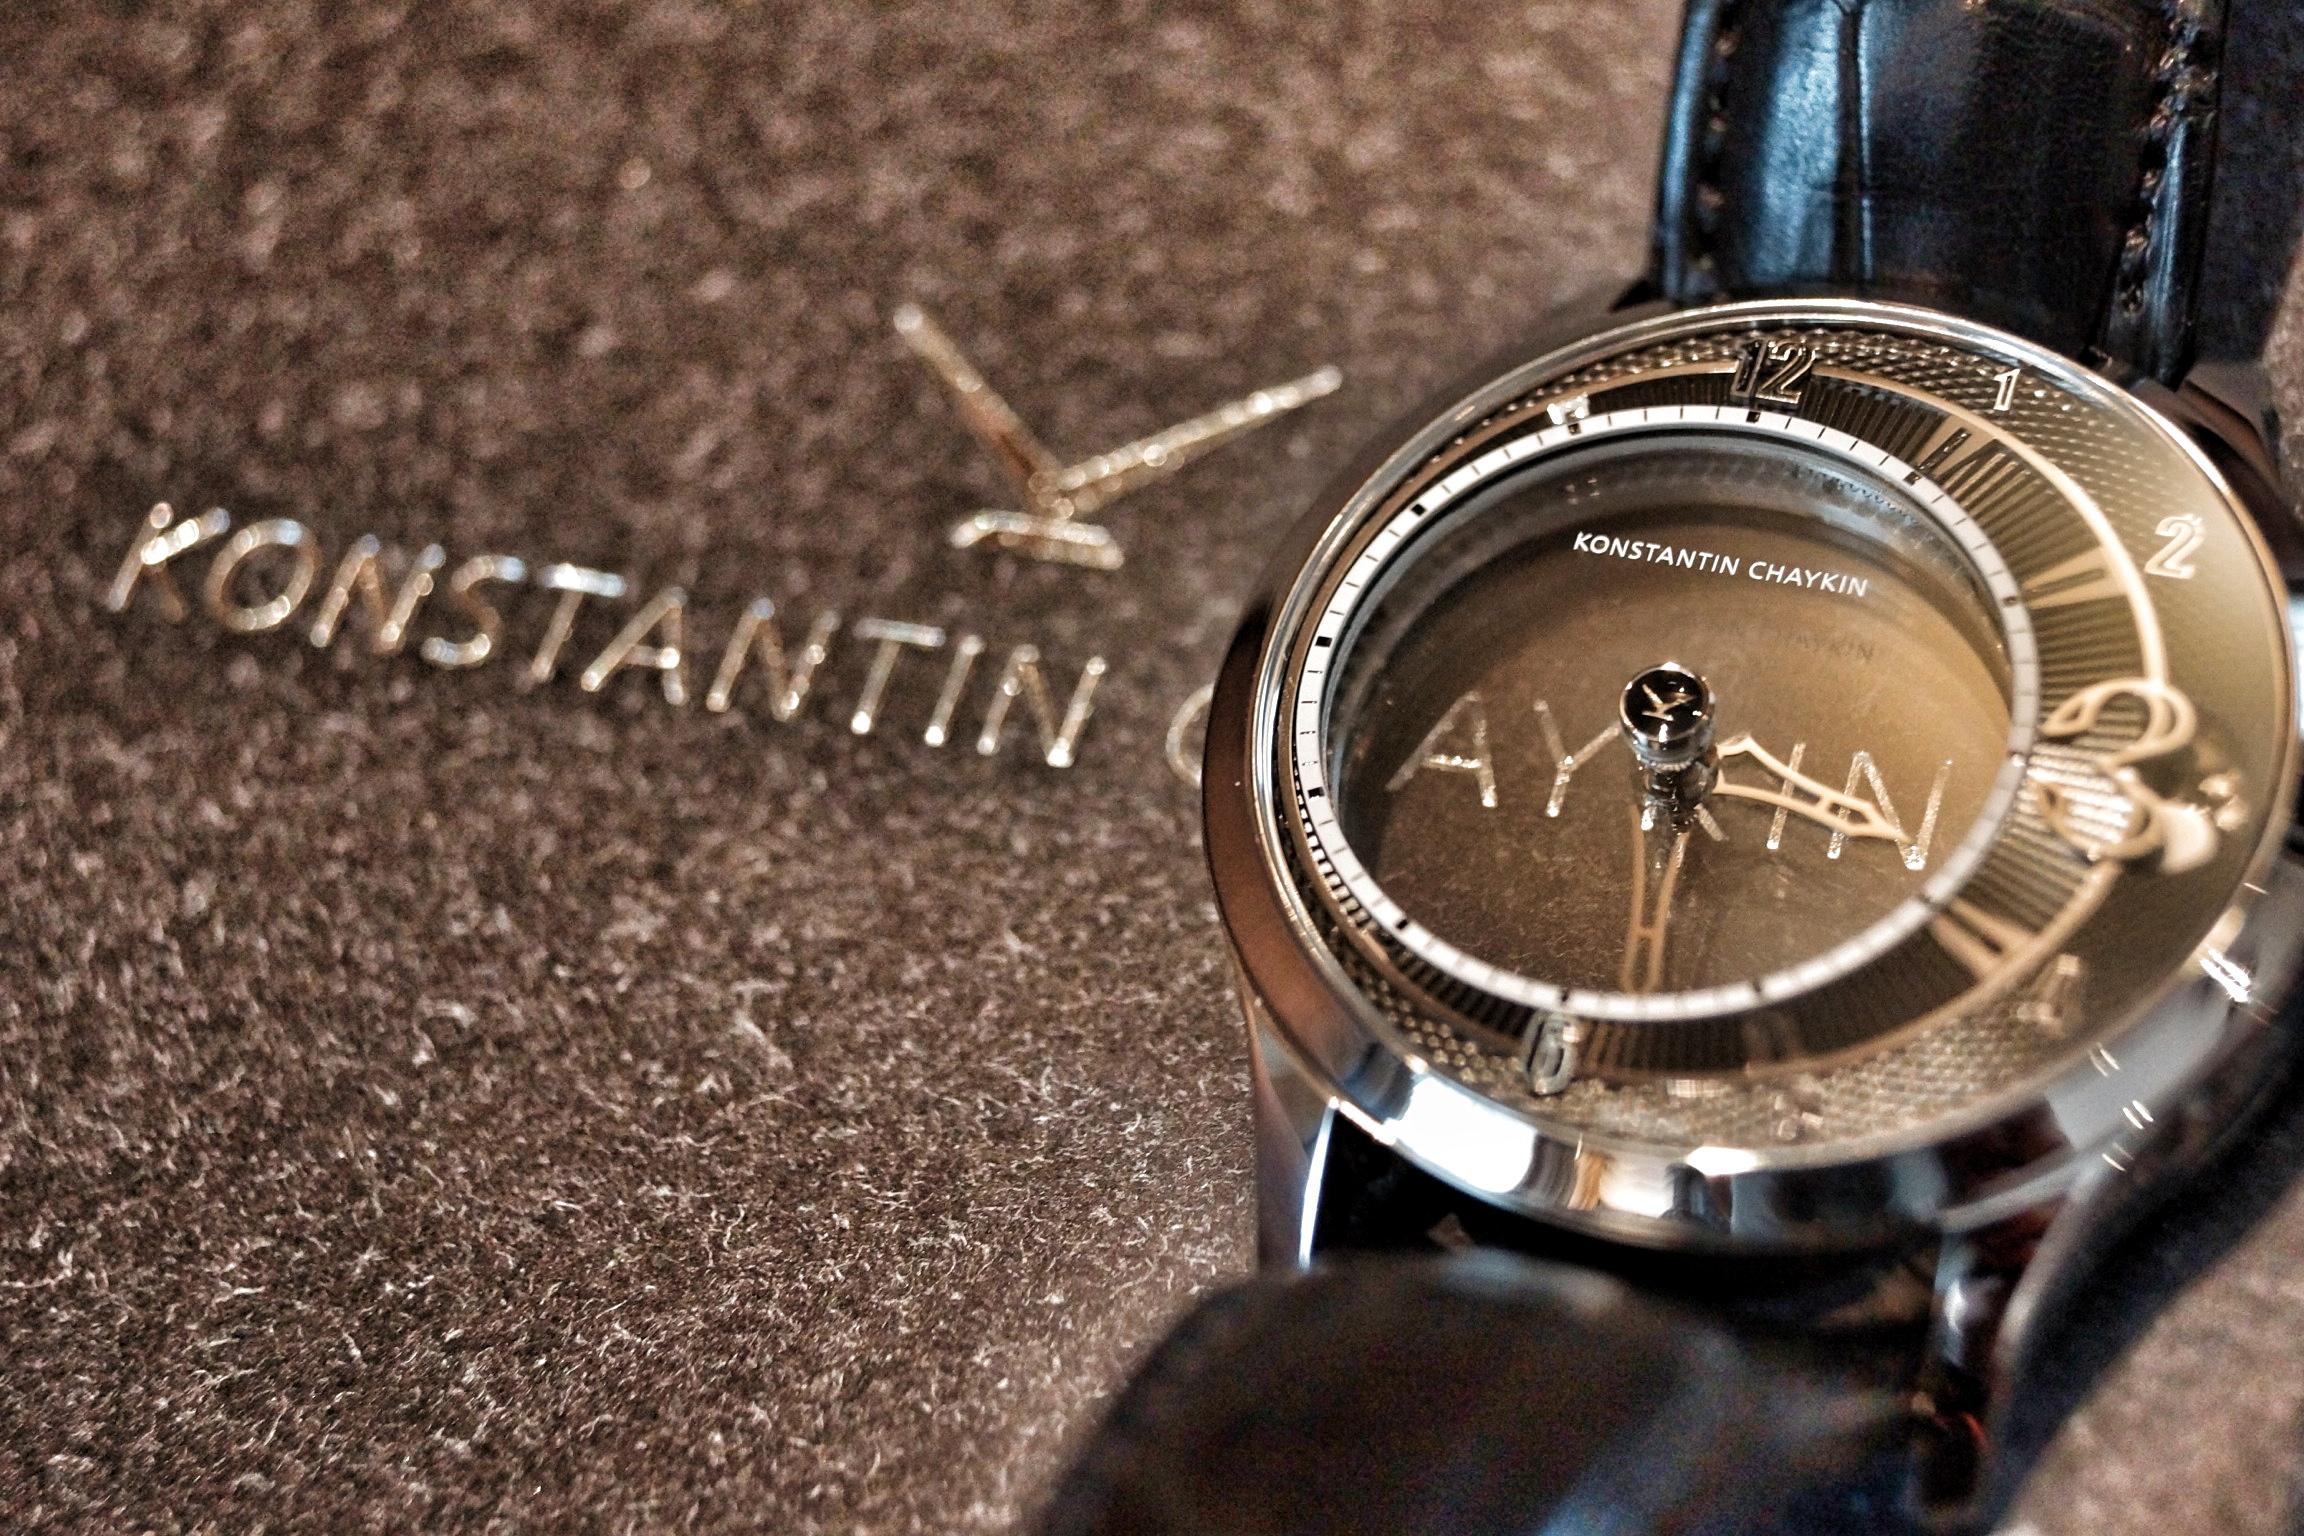 Konstantin Chaykin - Levitas Watch